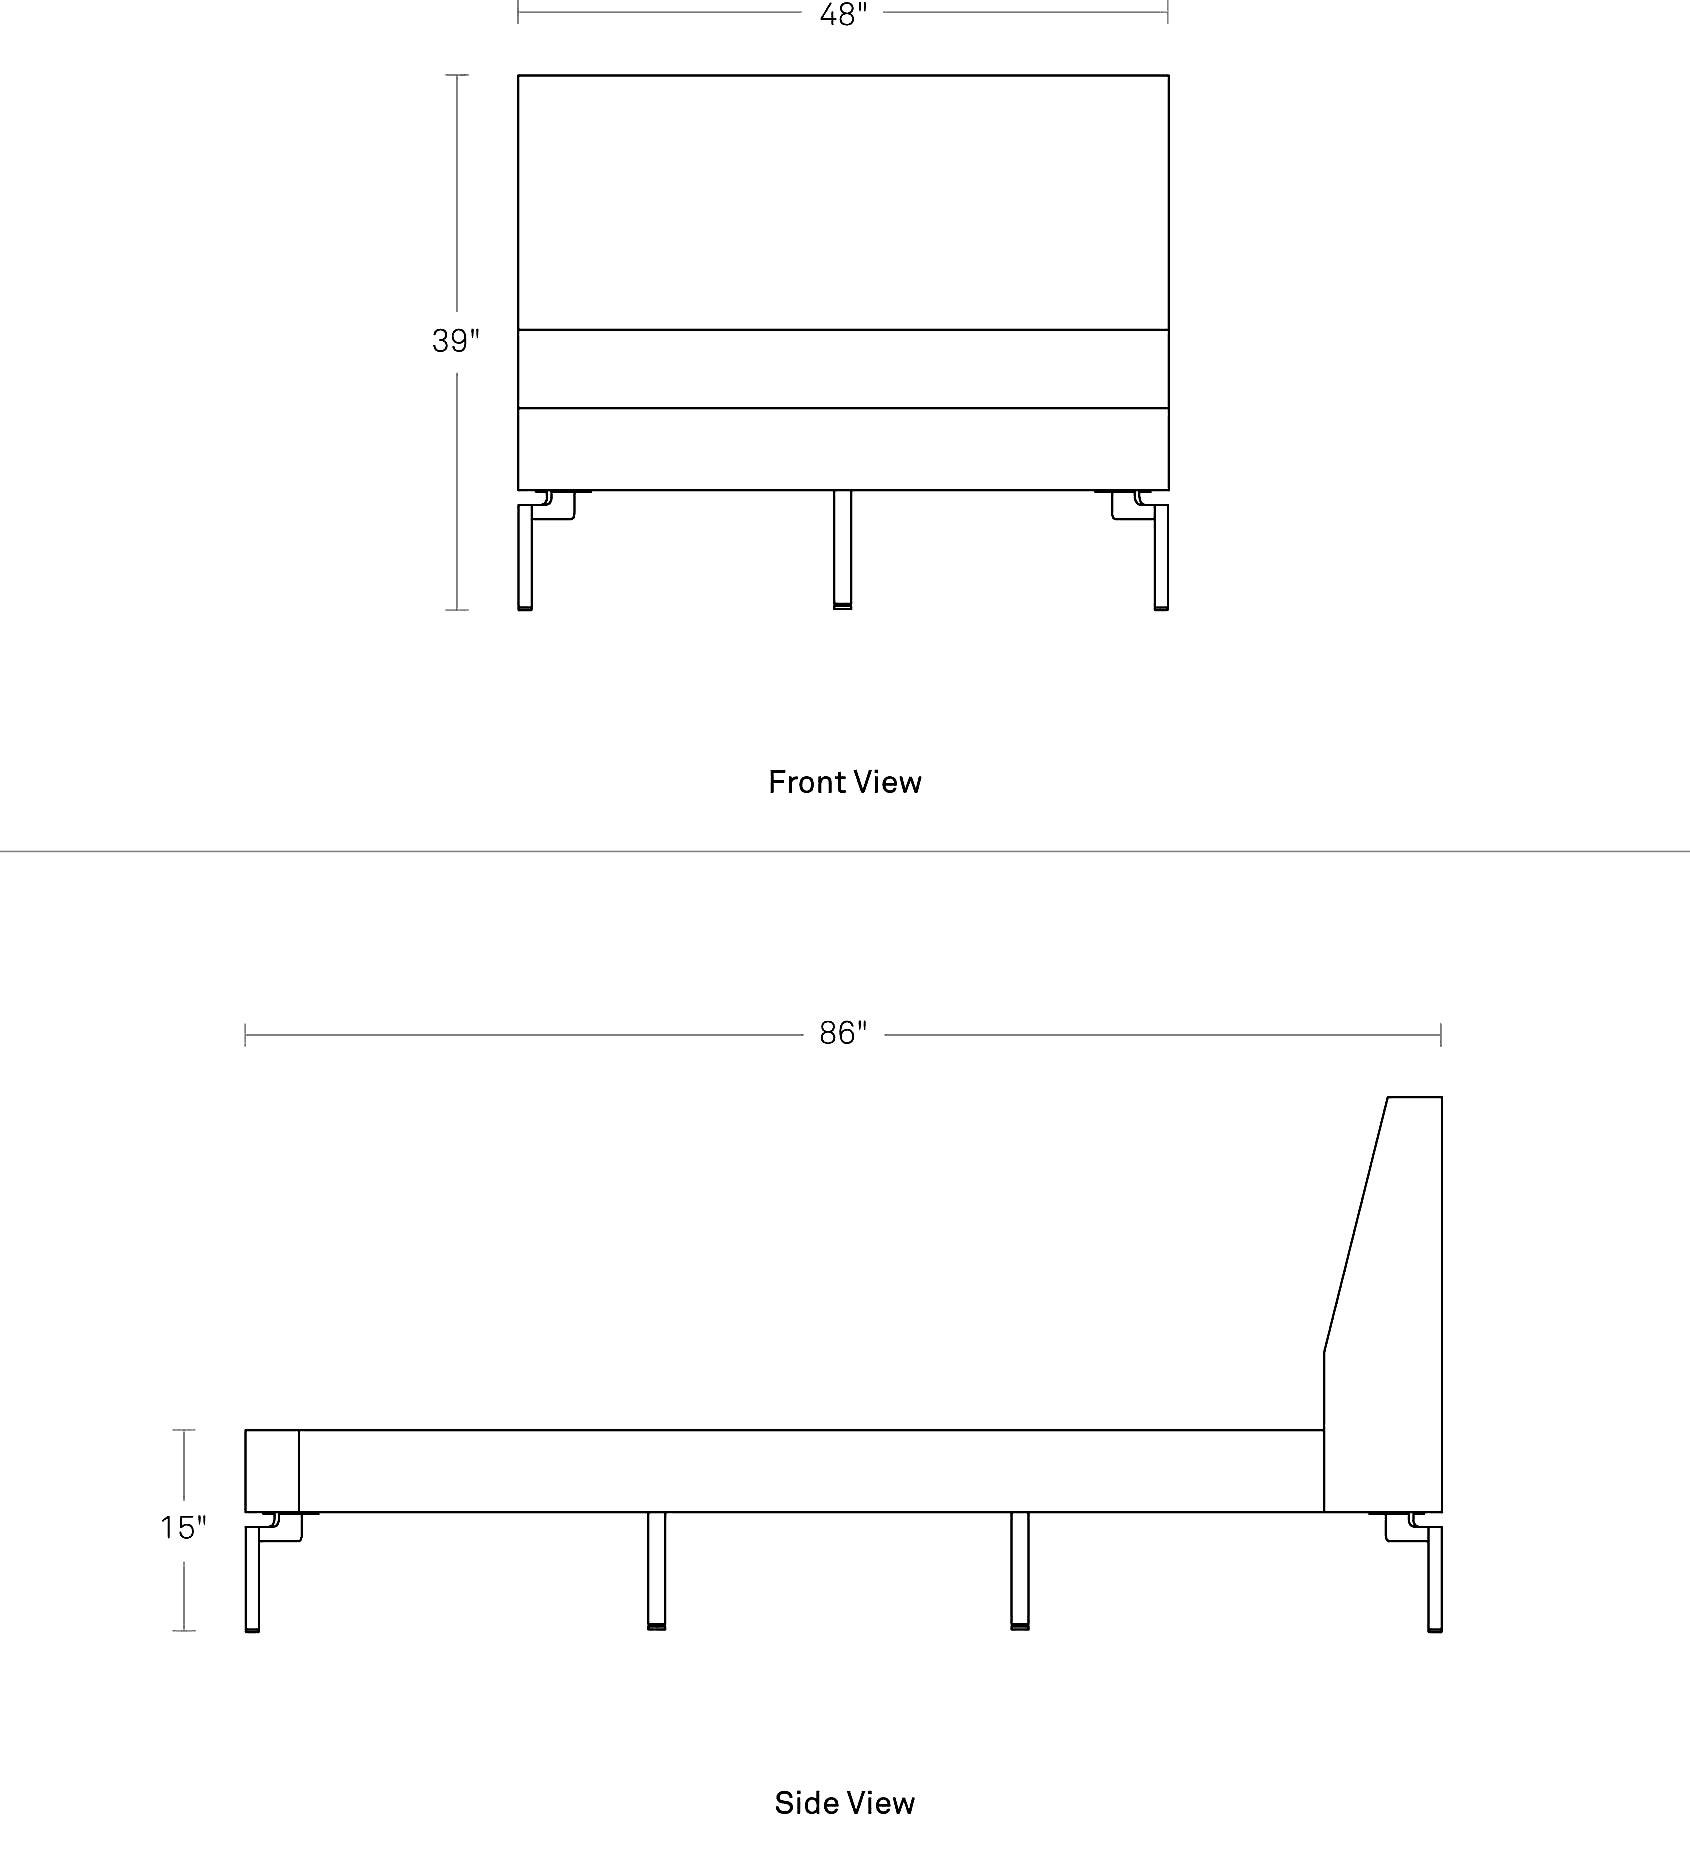 upholstered twin bed new standard twin bed blu dot. Black Bedroom Furniture Sets. Home Design Ideas